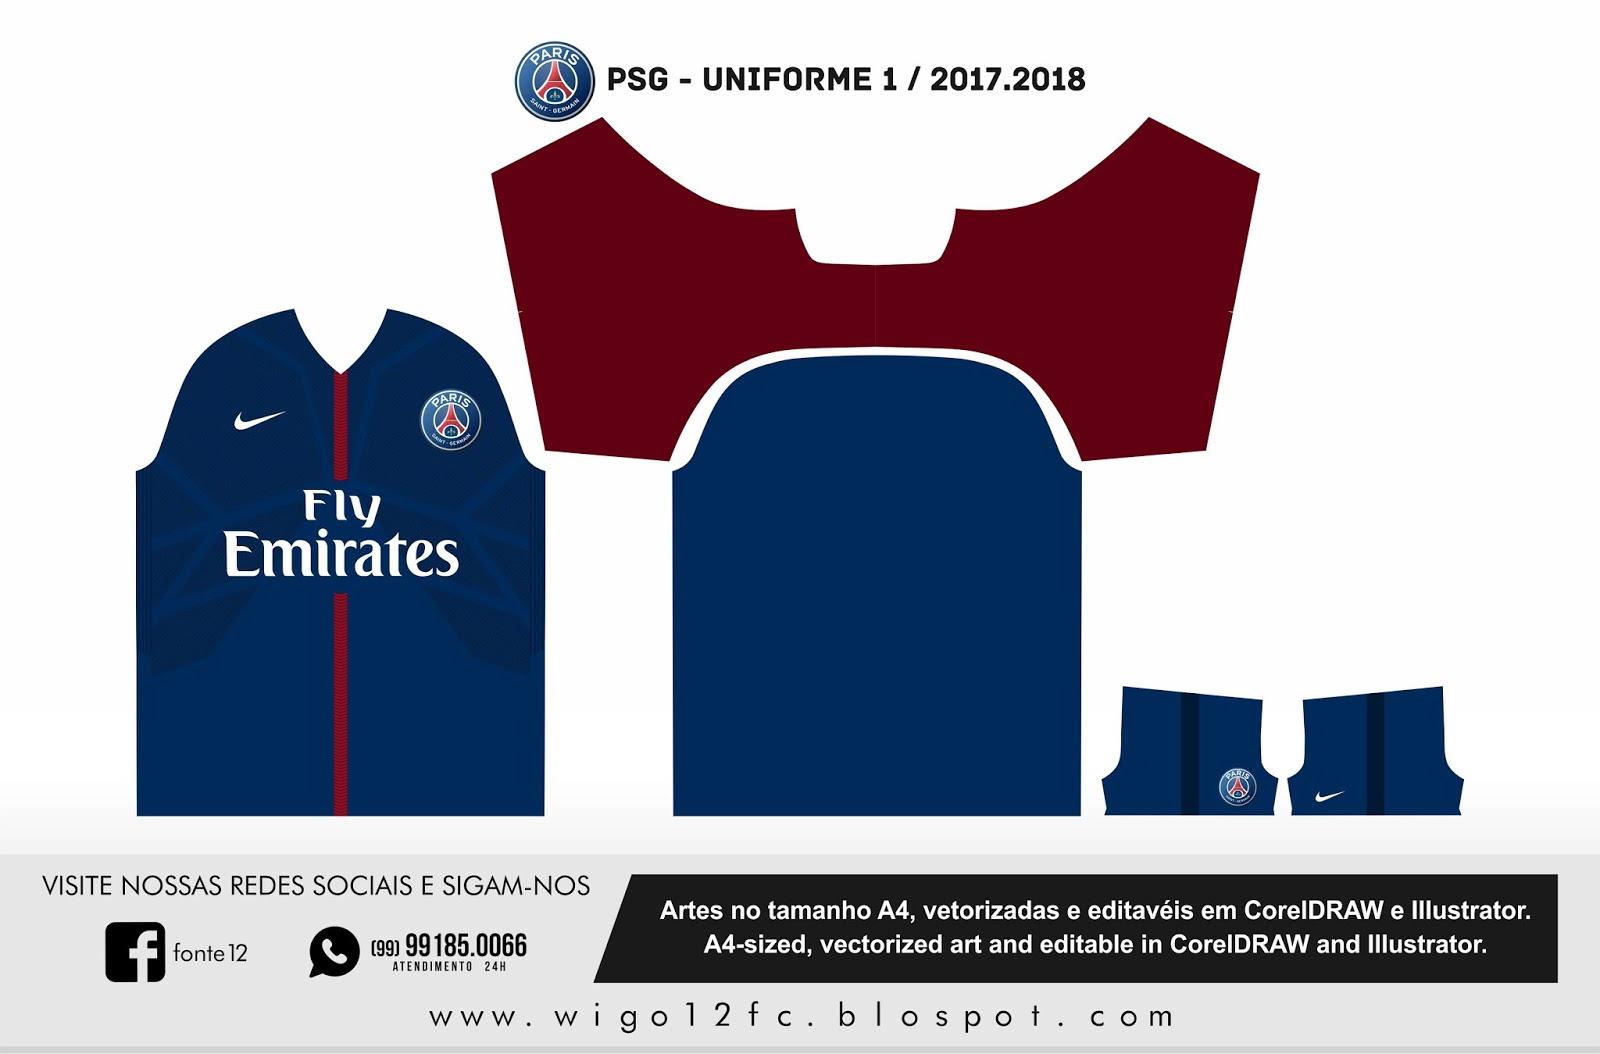 fontes camisas futebol uniforme psg 2017 2018. Black Bedroom Furniture Sets. Home Design Ideas